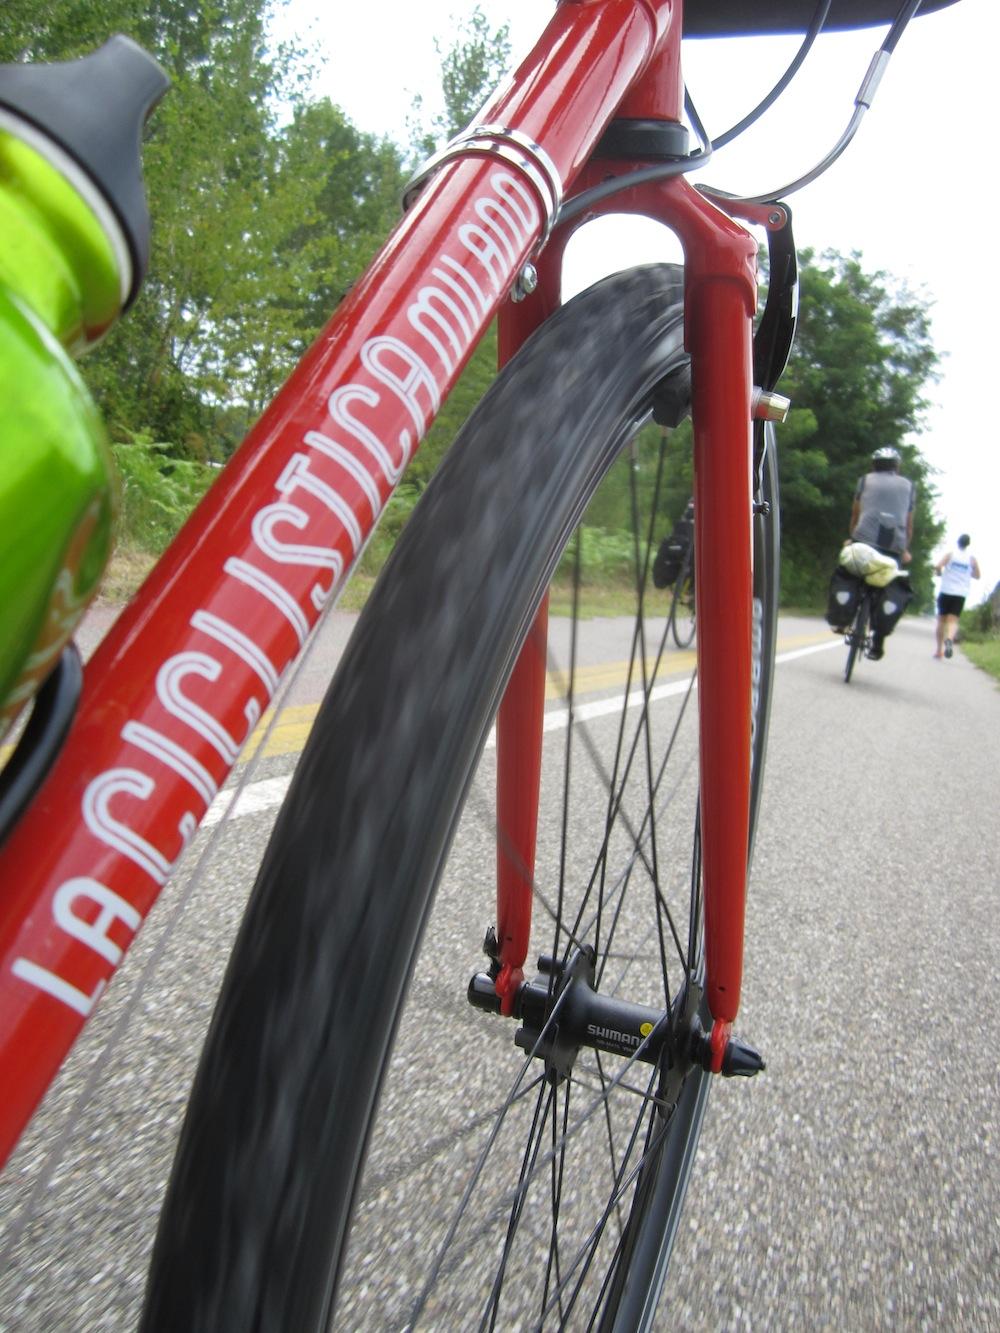 la ciclistica running